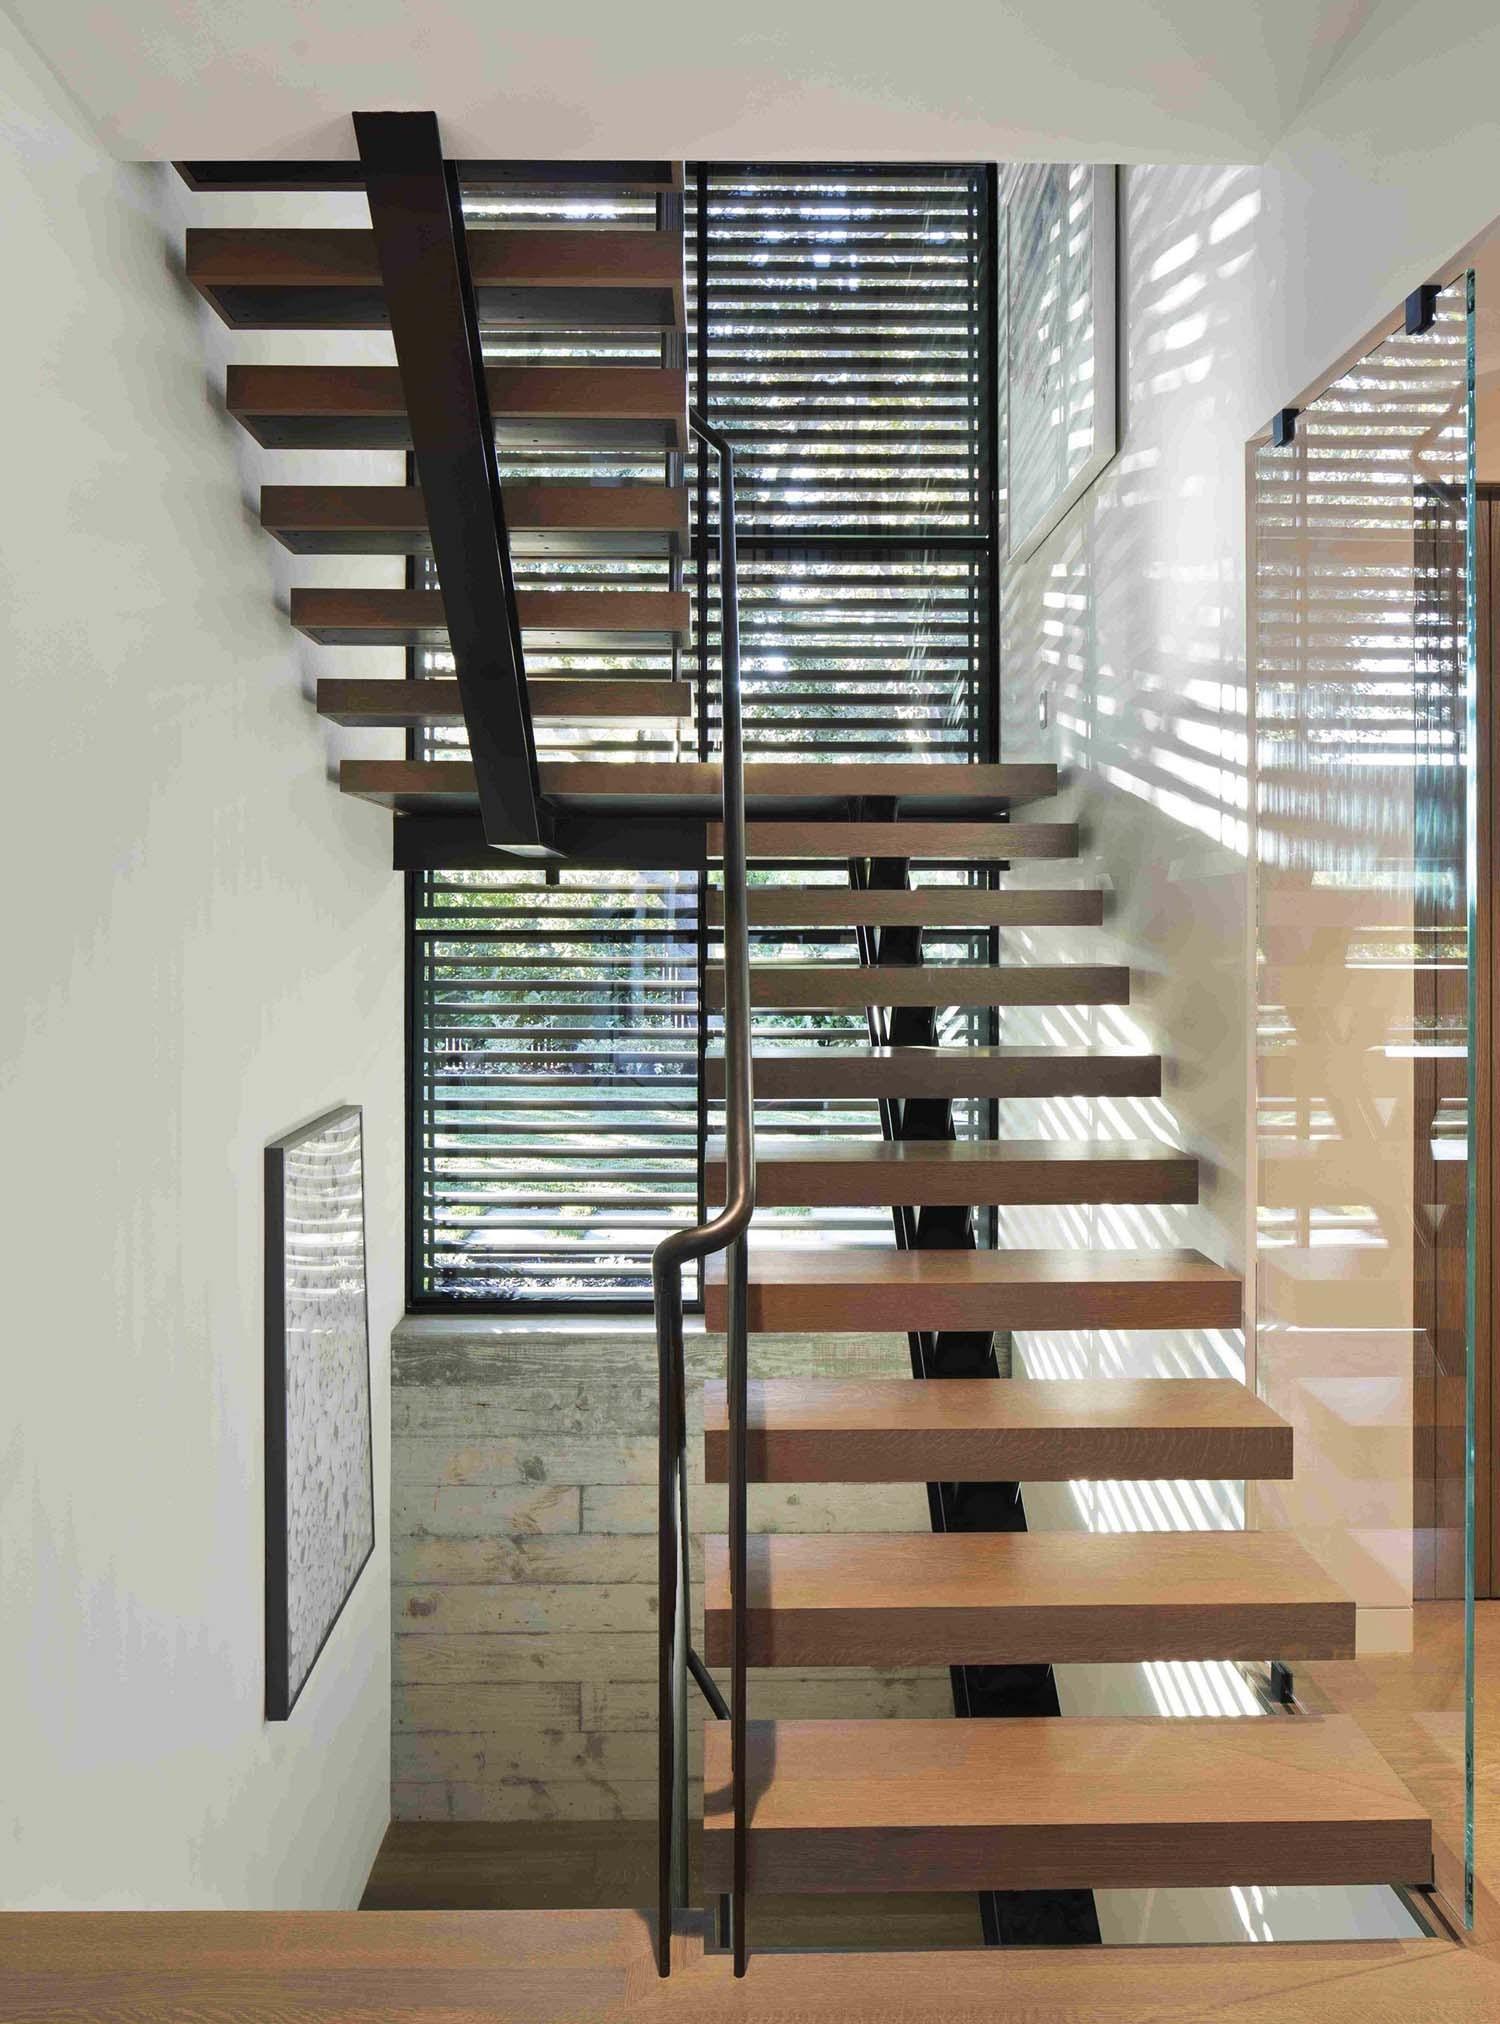 Modern Staircase Design Contemporary Stair Design Ideas | Building Half Round Wood Steps | Curved | Precast Concrete Steps | Outdoor | Concrete Slab | Risers